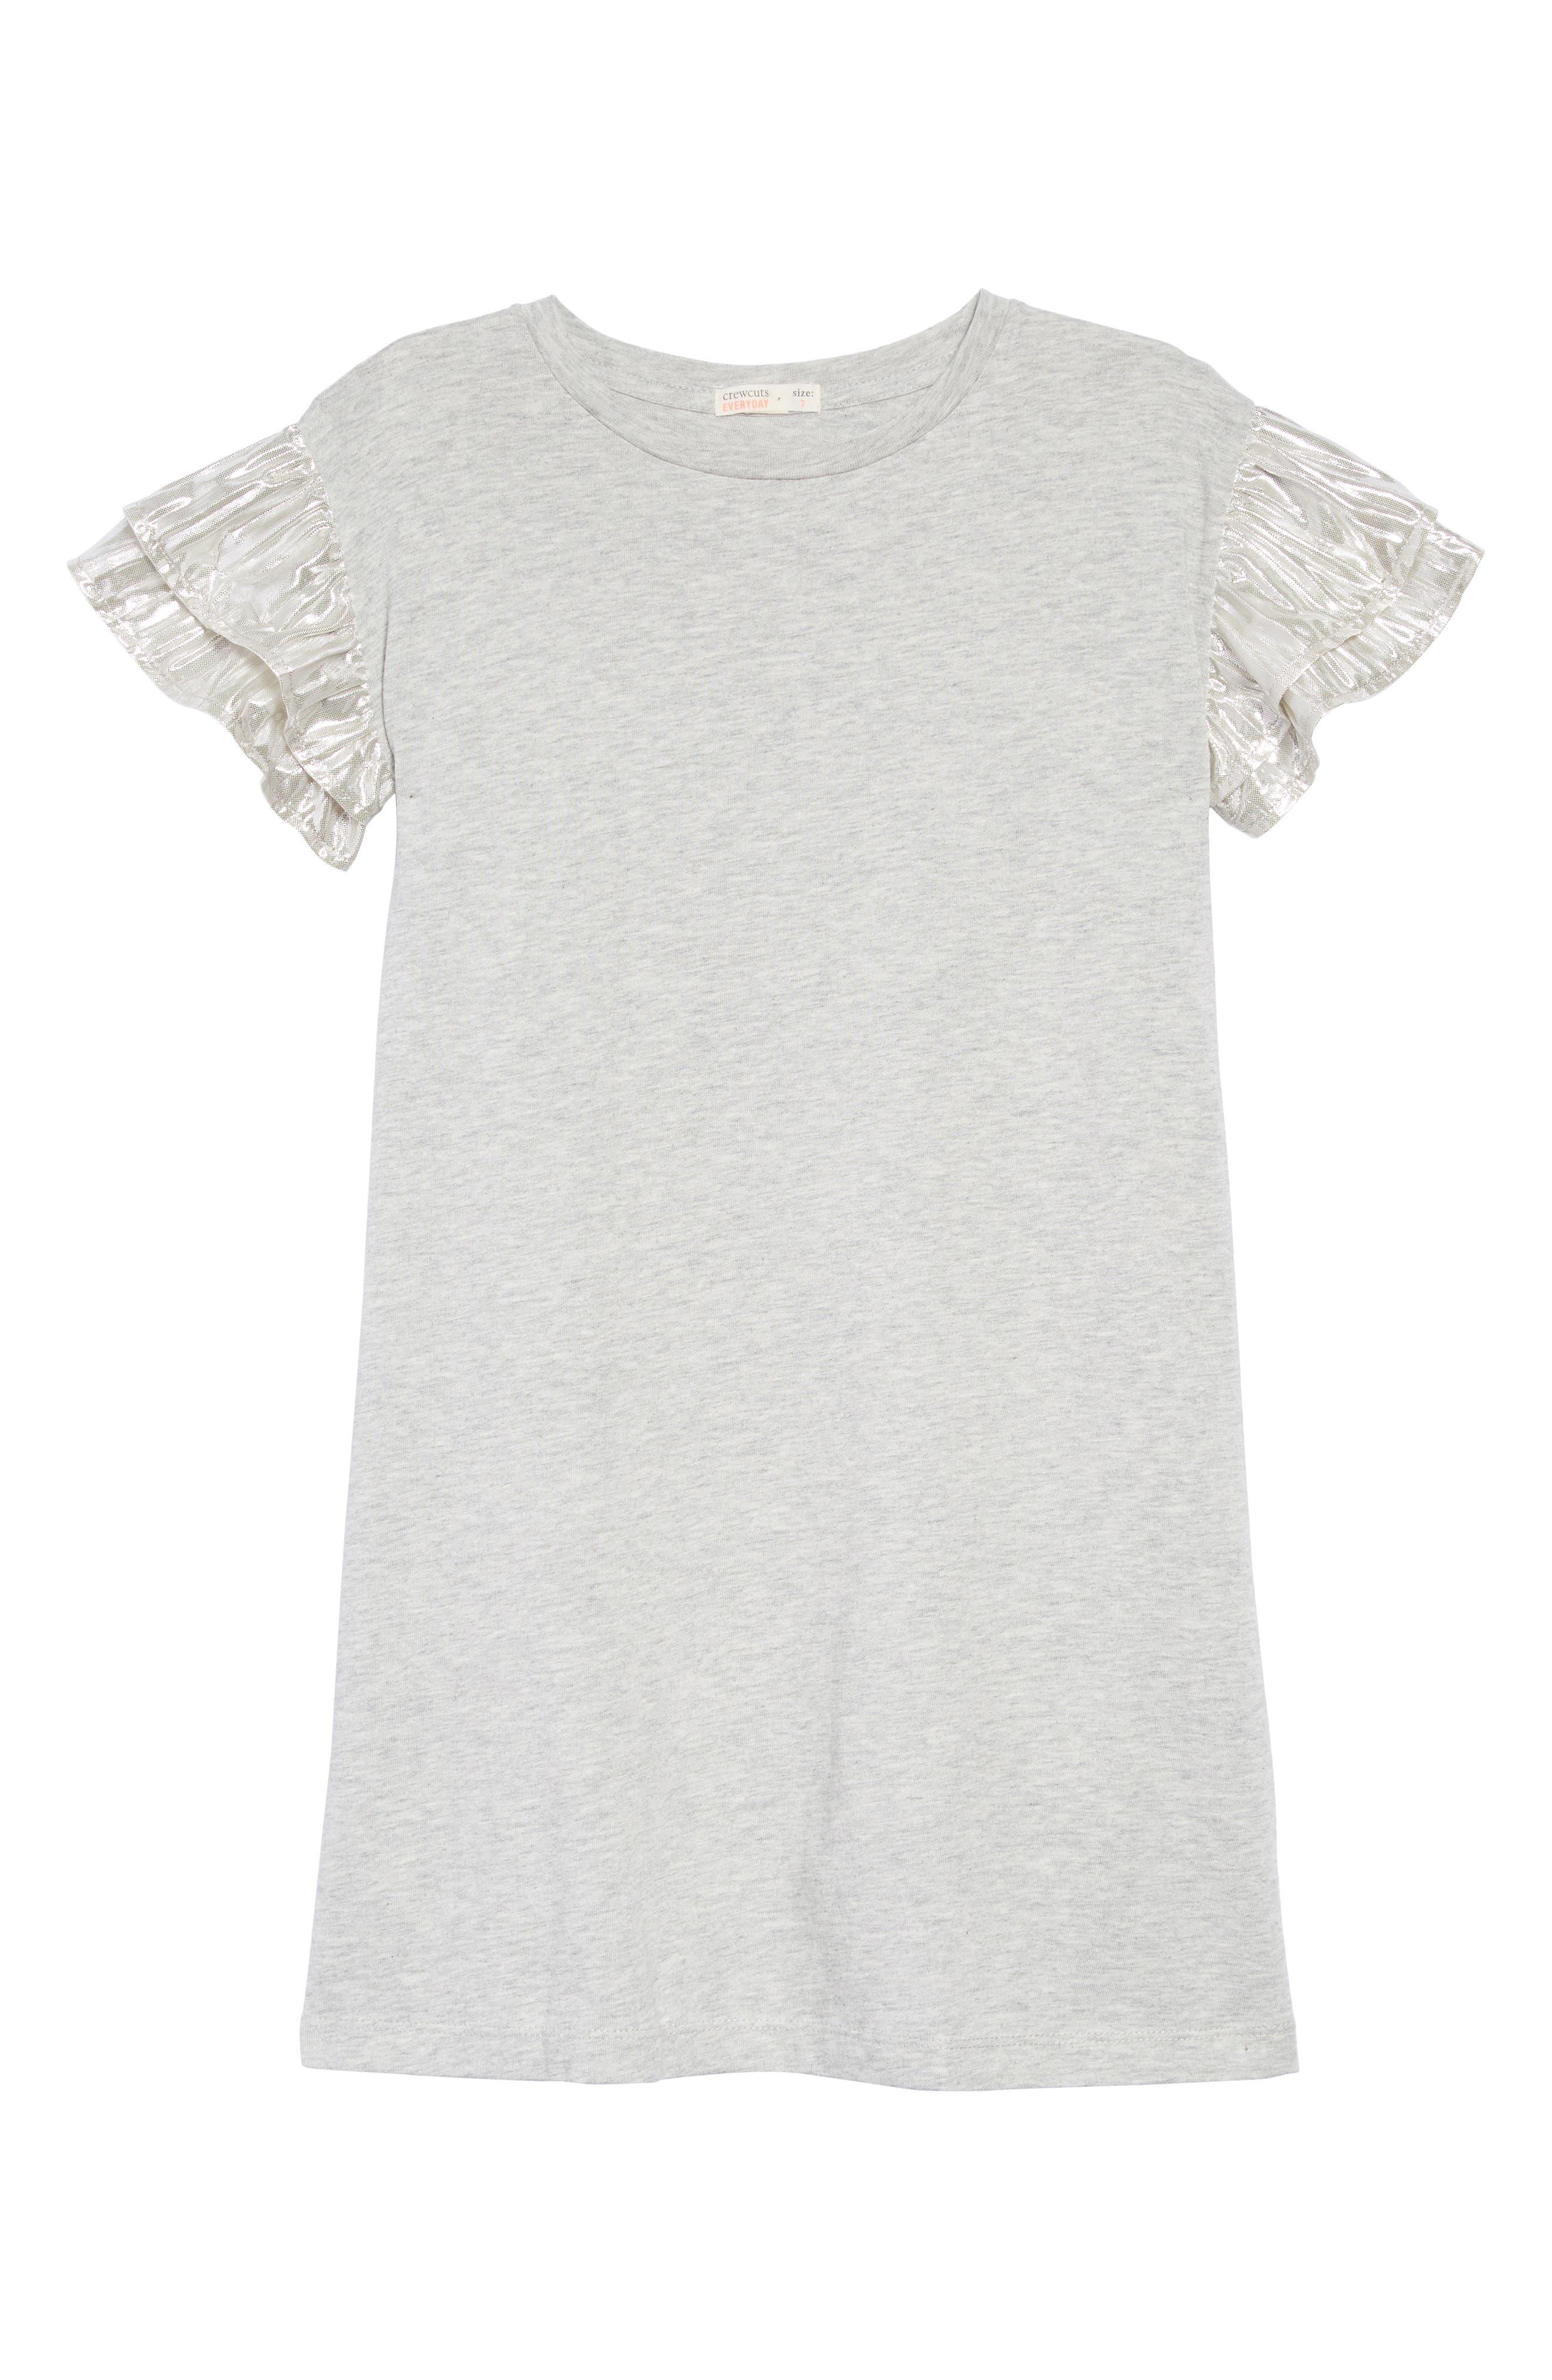 T-Shirt Dress,                             Main thumbnail 1, color,                             HEATHER DUSK